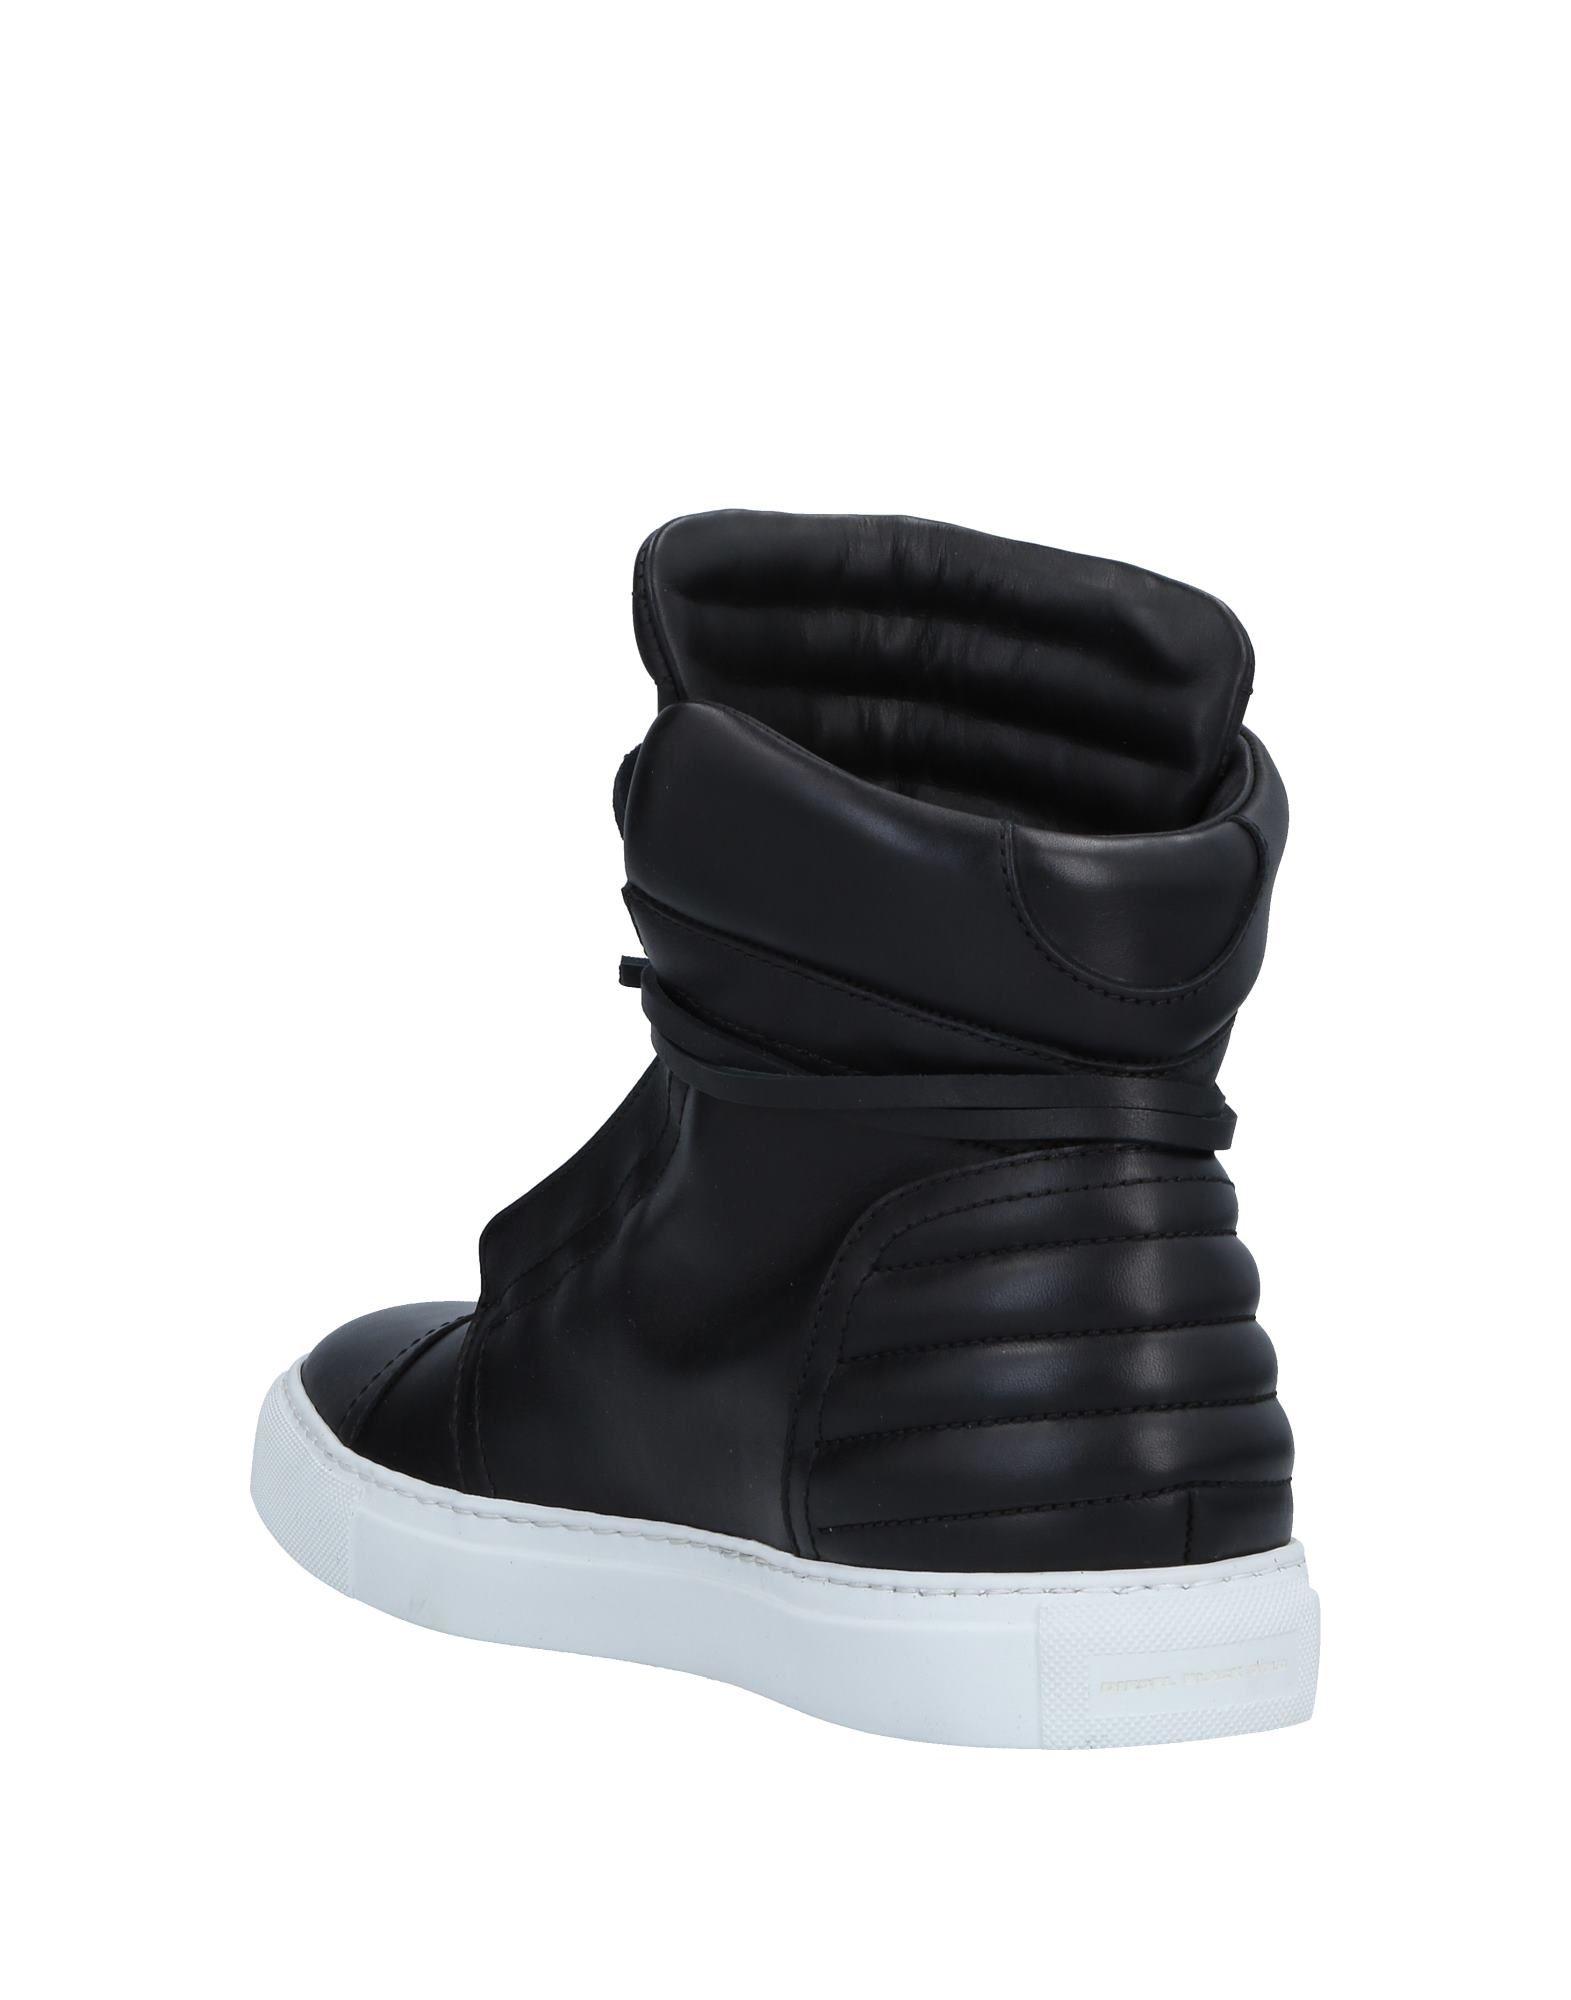 Diesel Black Gold 11532724PK Sneakers Herren  11532724PK Gold d04ec8